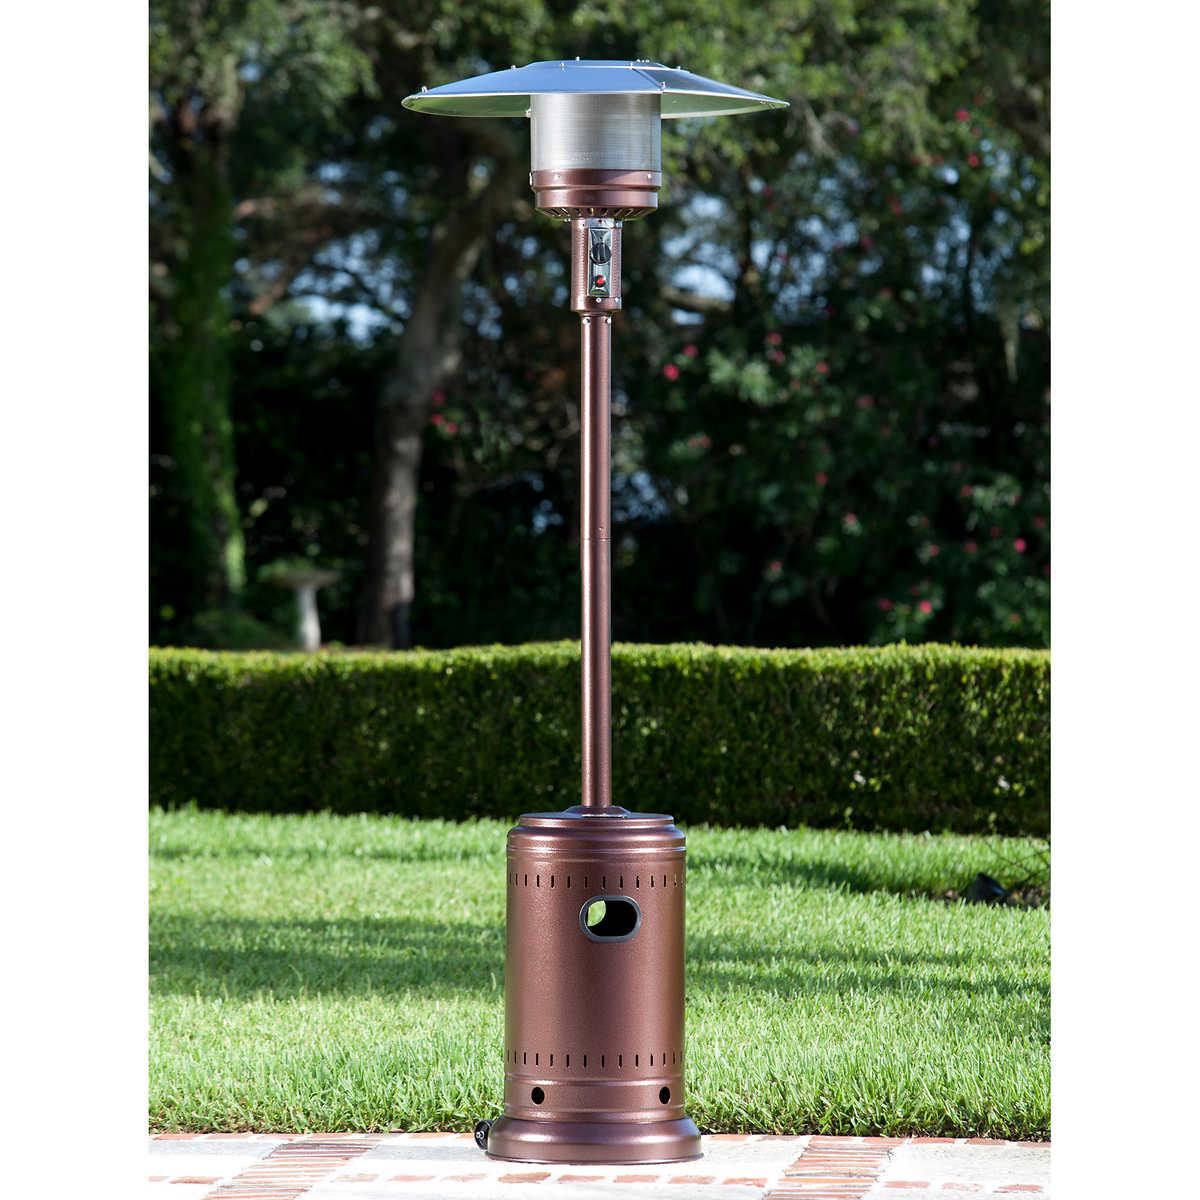 Paramount Bronze Patio Heater with Wheels - Patio Heaters & Fire Columns Costco